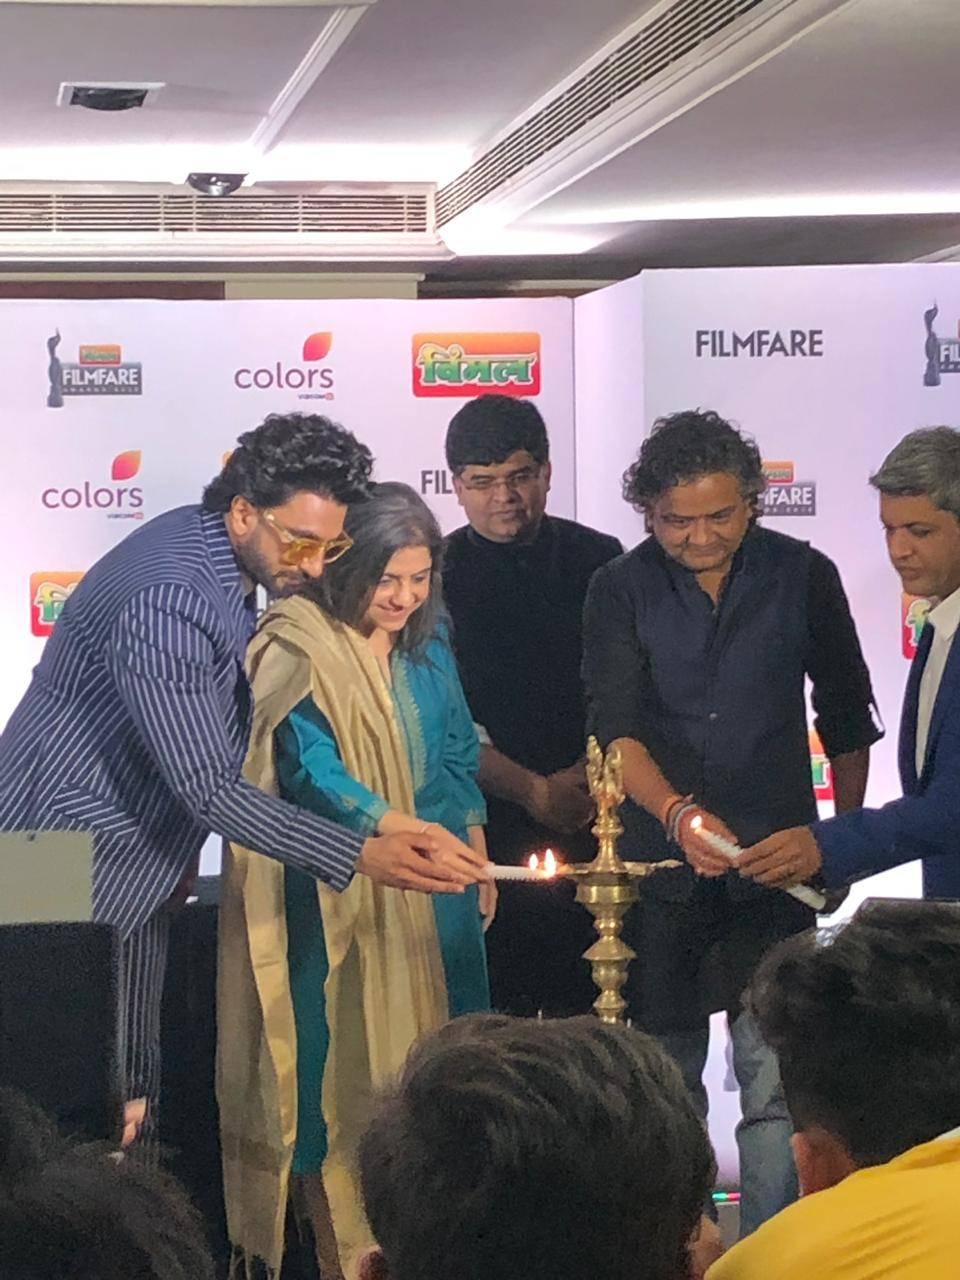 Filmfare 2019 (1).